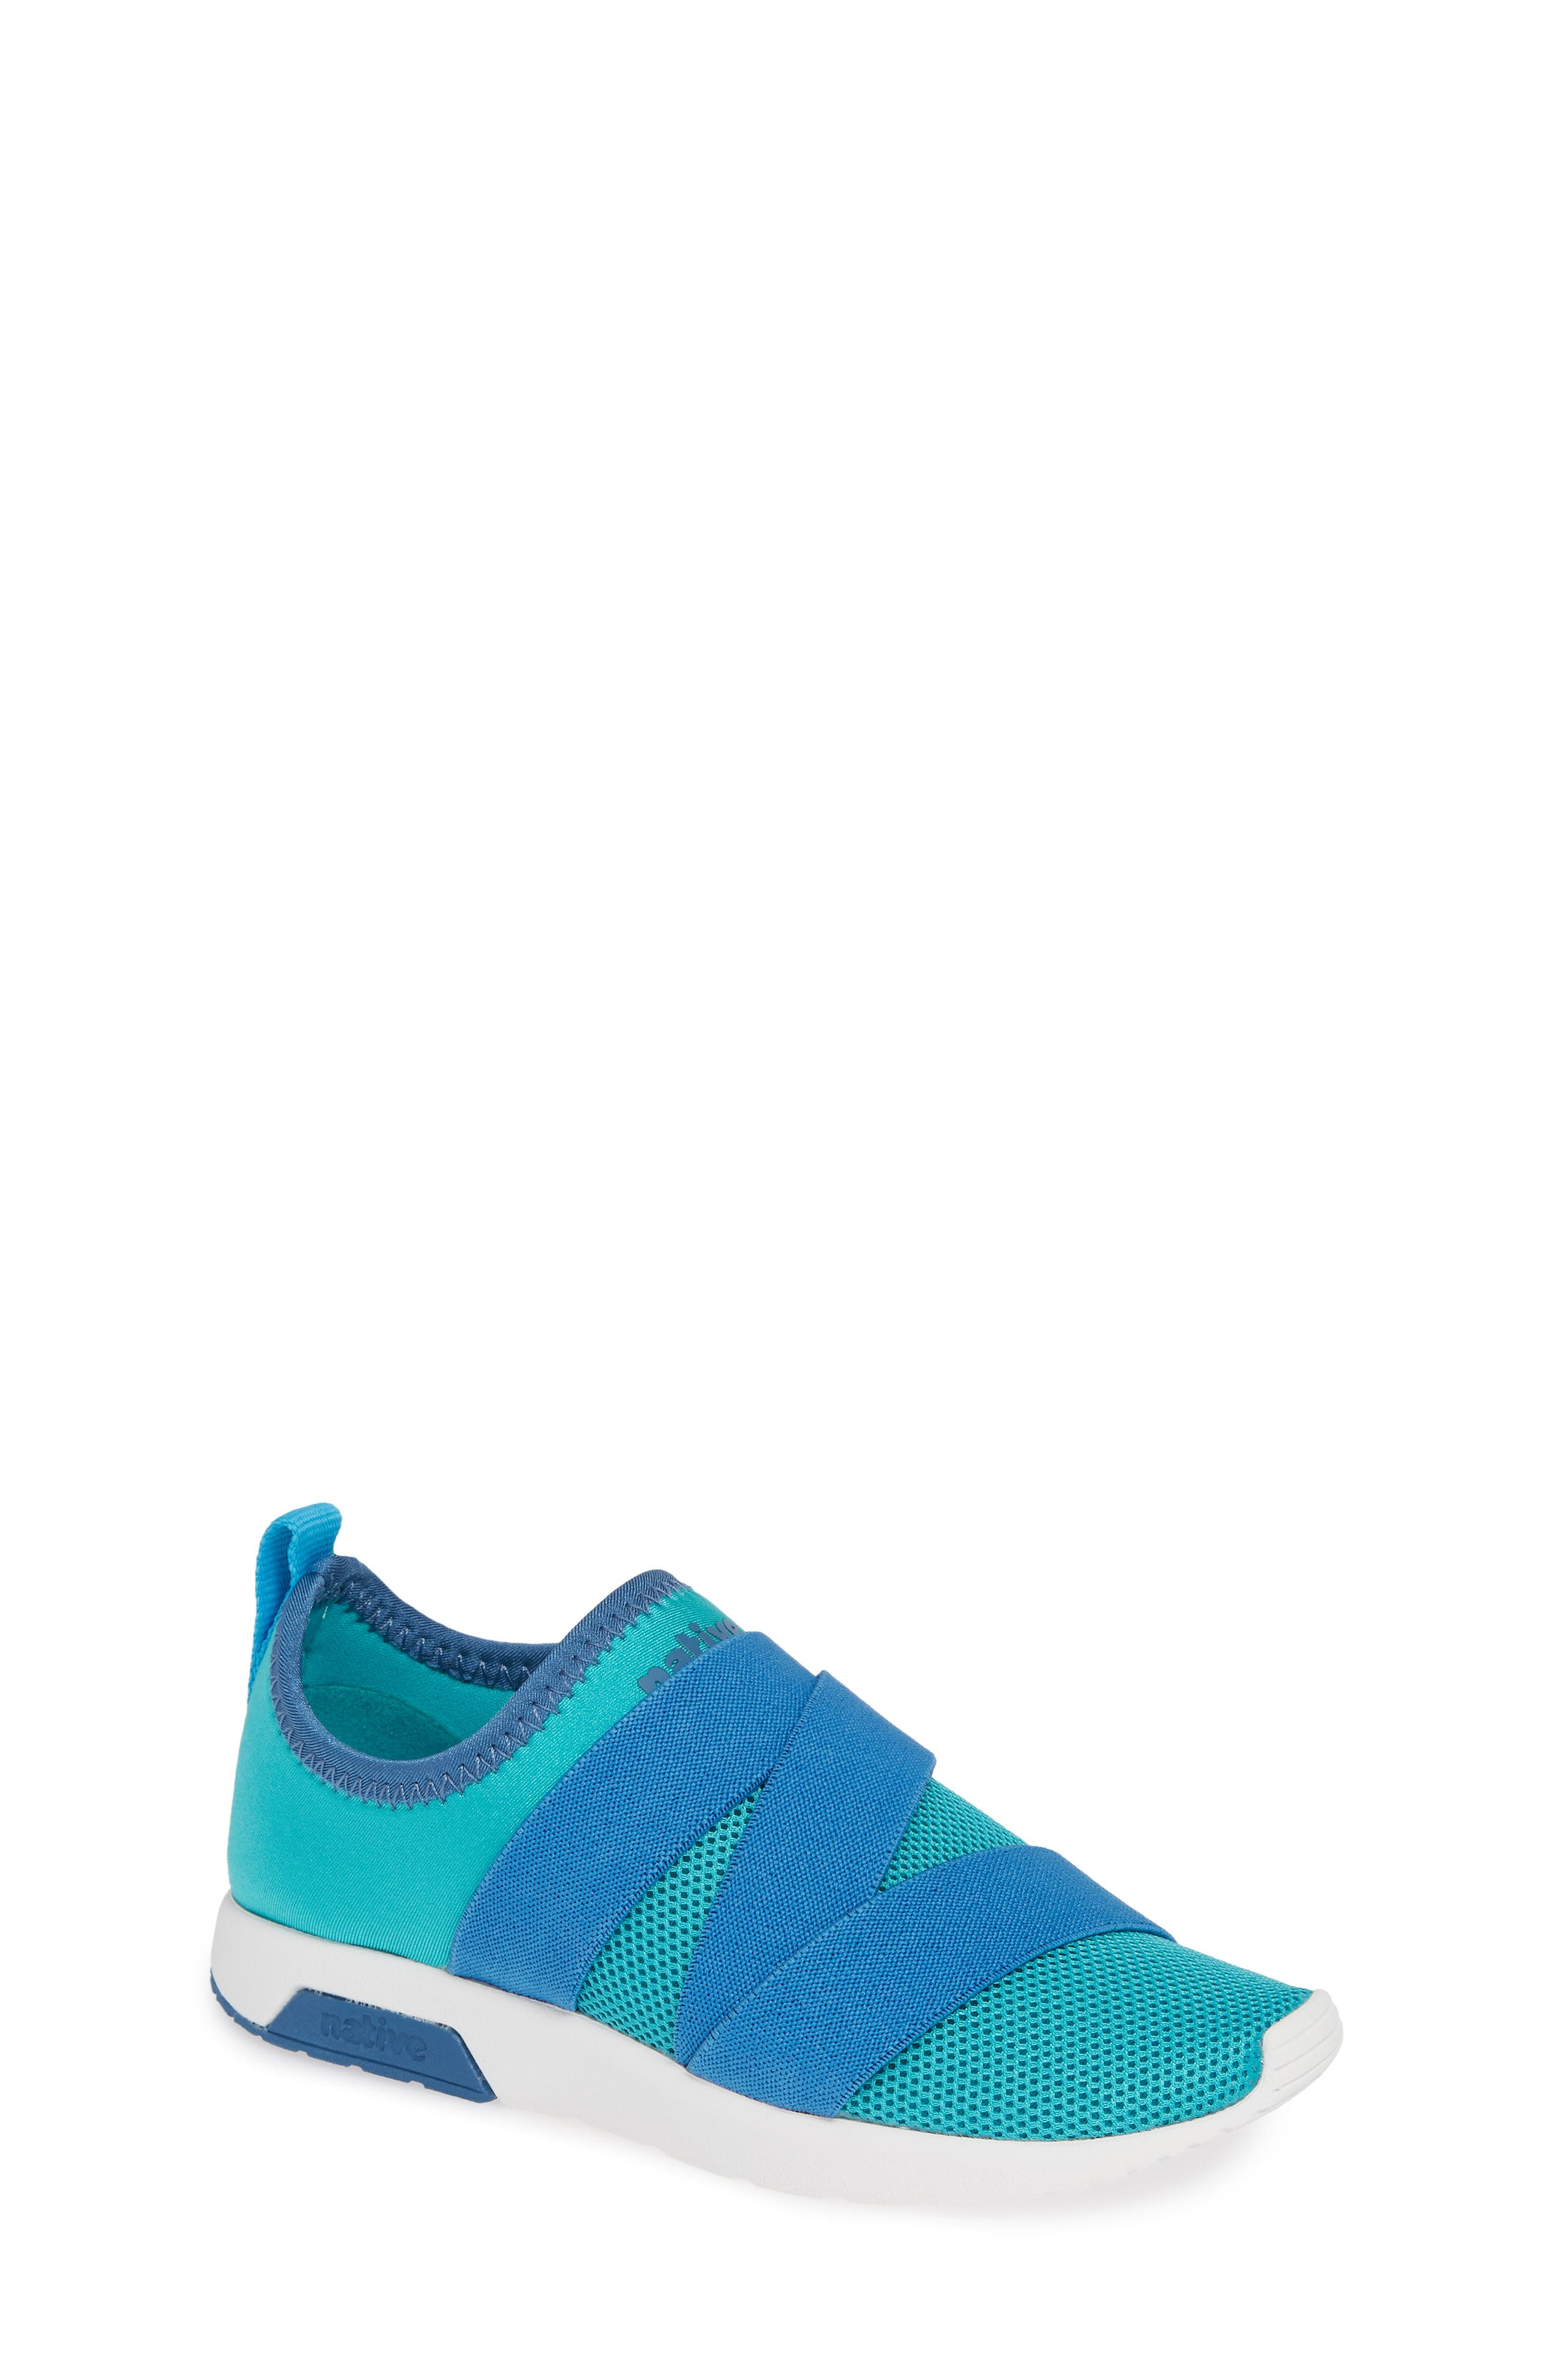 NATIVE SHOES Phoenix Slip-On Vegan Sneaker, Main, color, GLACIER GREEN/ BLUE/ WHITE